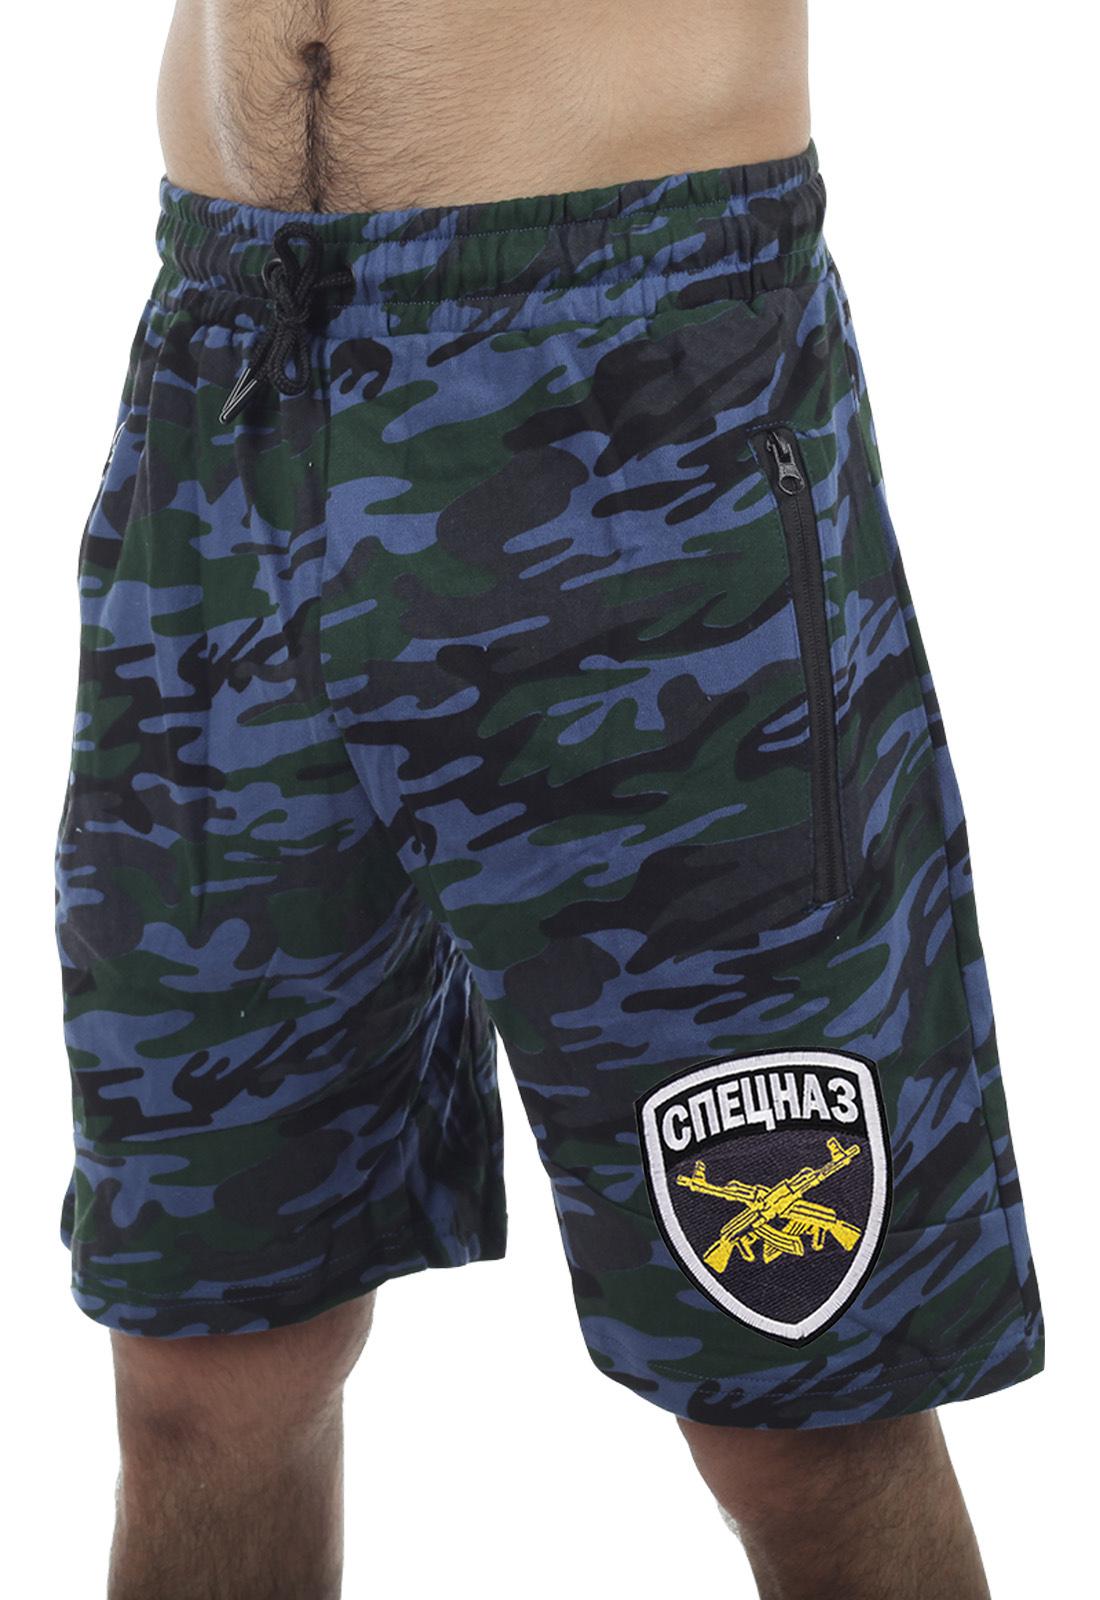 Мужские шорты до колен с символикой Спецназа